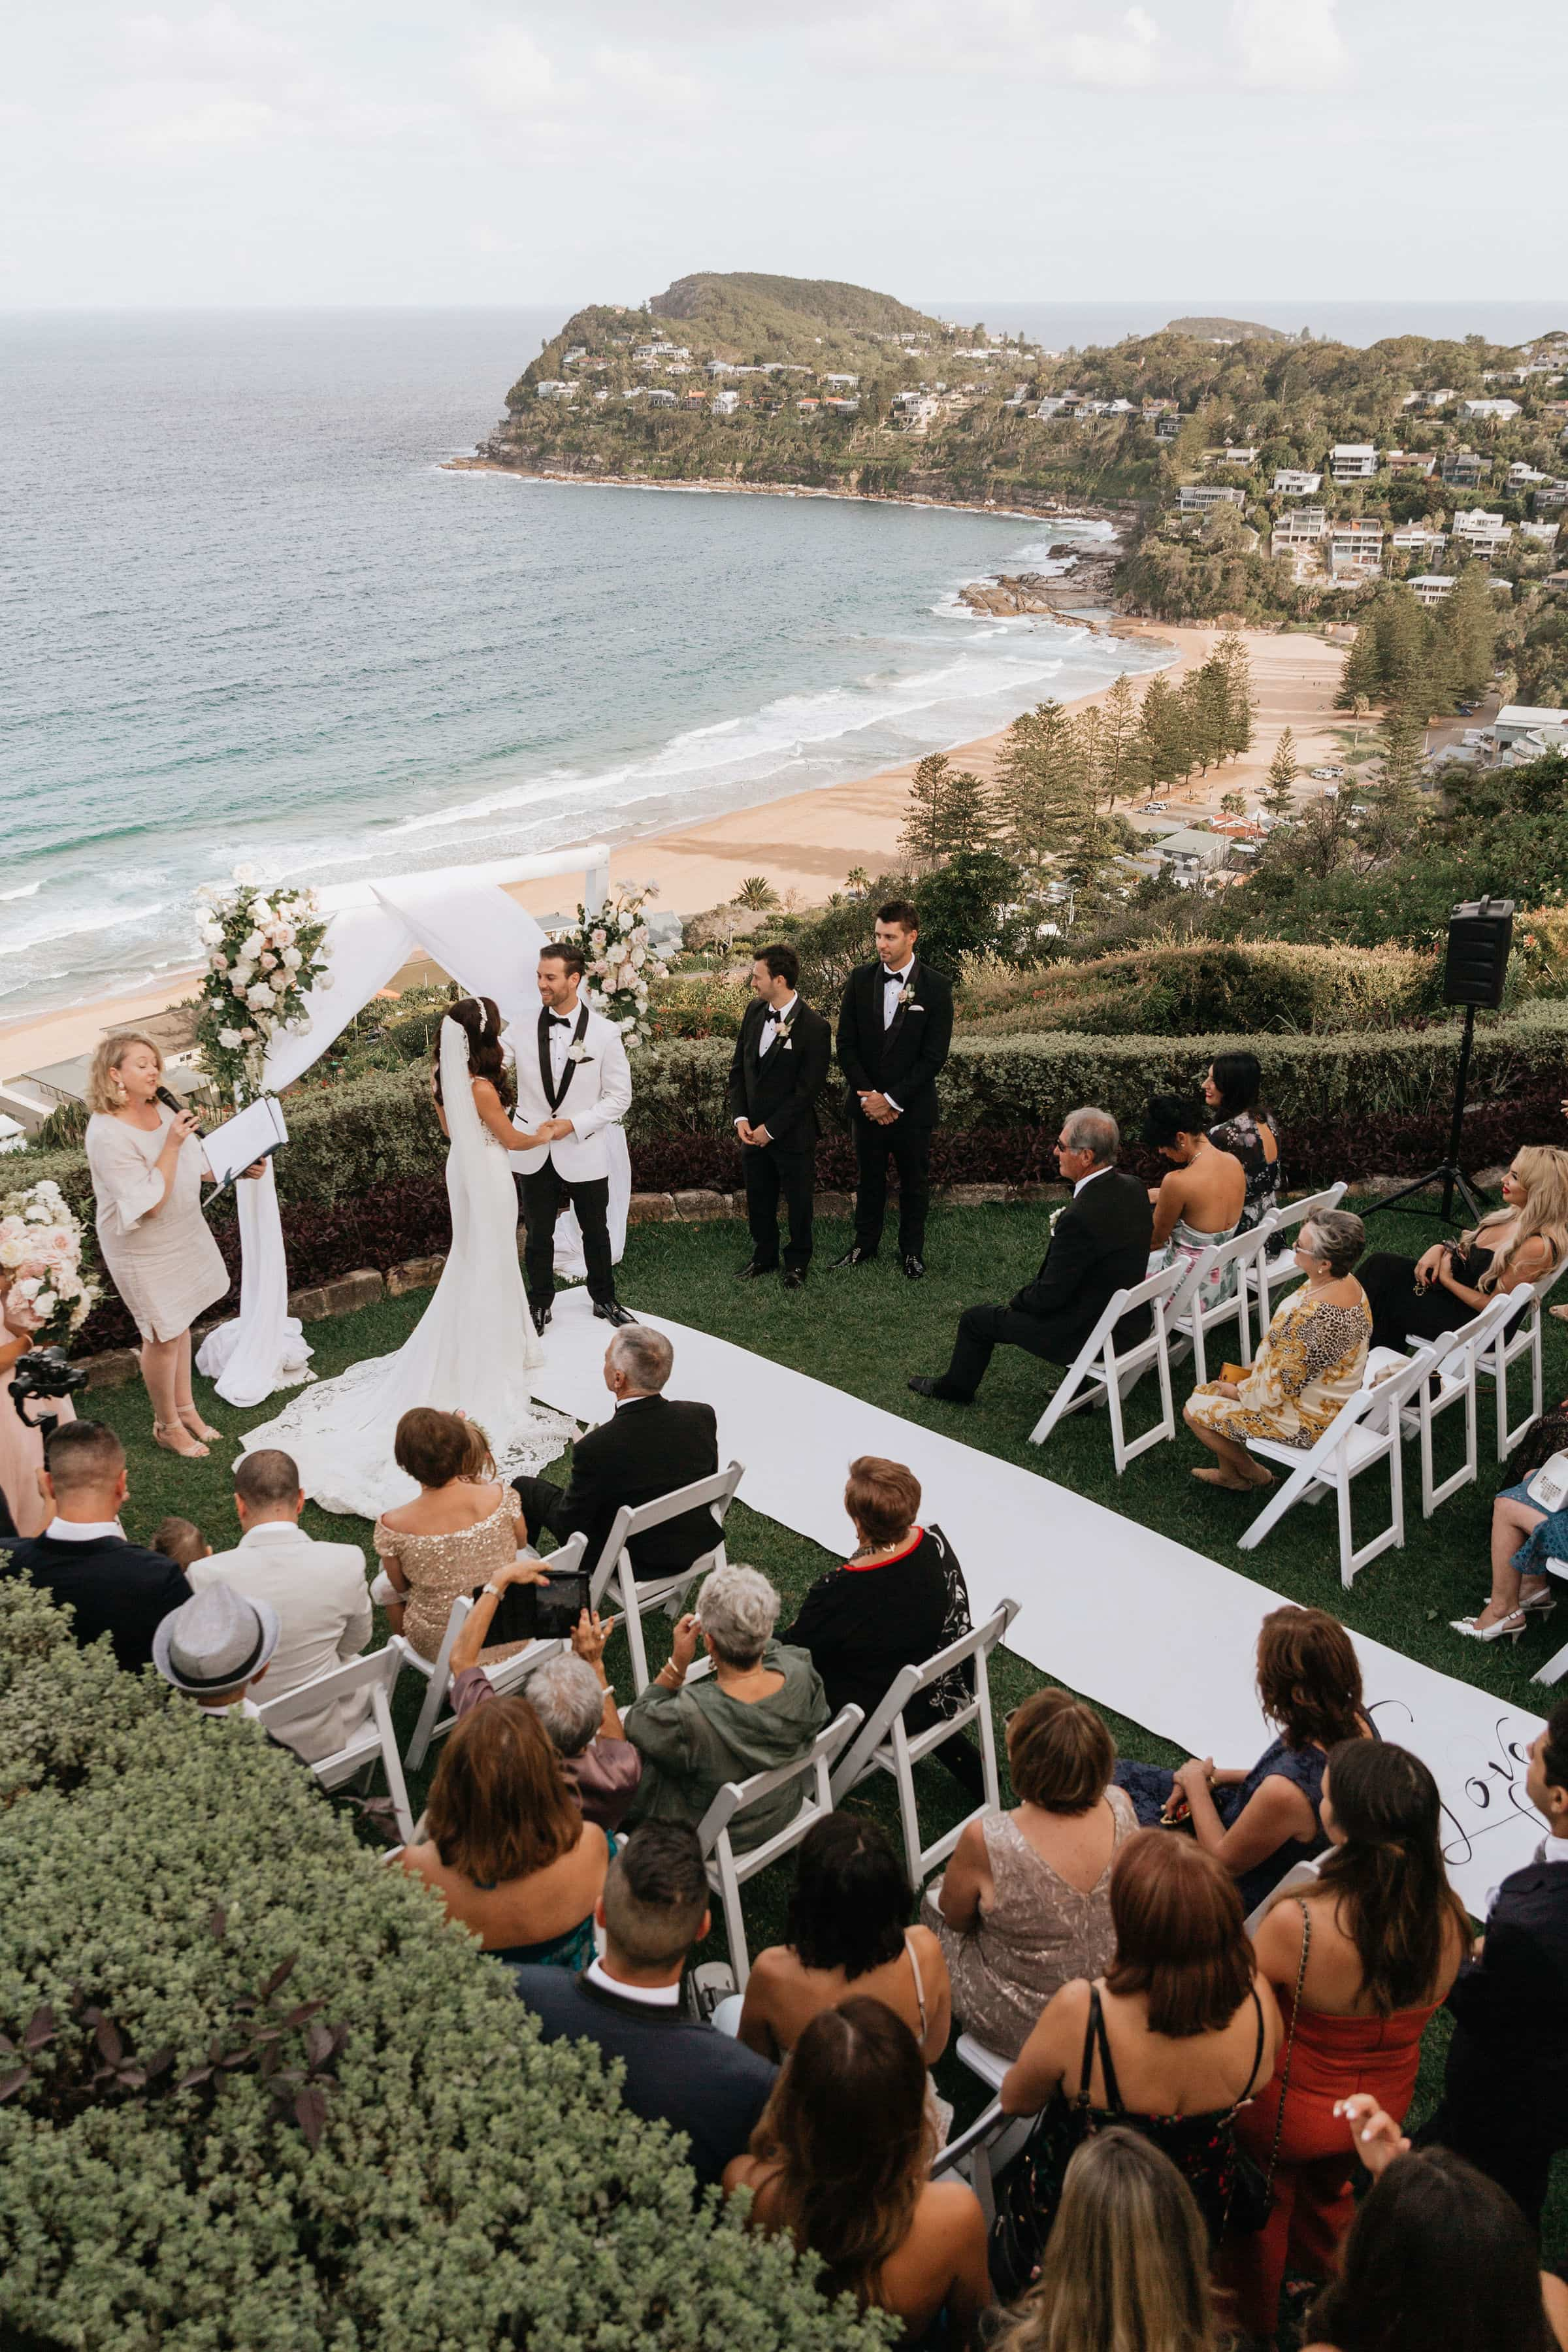 Jonah's, Jonah's Restaurant, Jonah's Wedding, Wedding, Wedding Venue, Wedding Ceremony, Wedding Reception, Destination Wedding